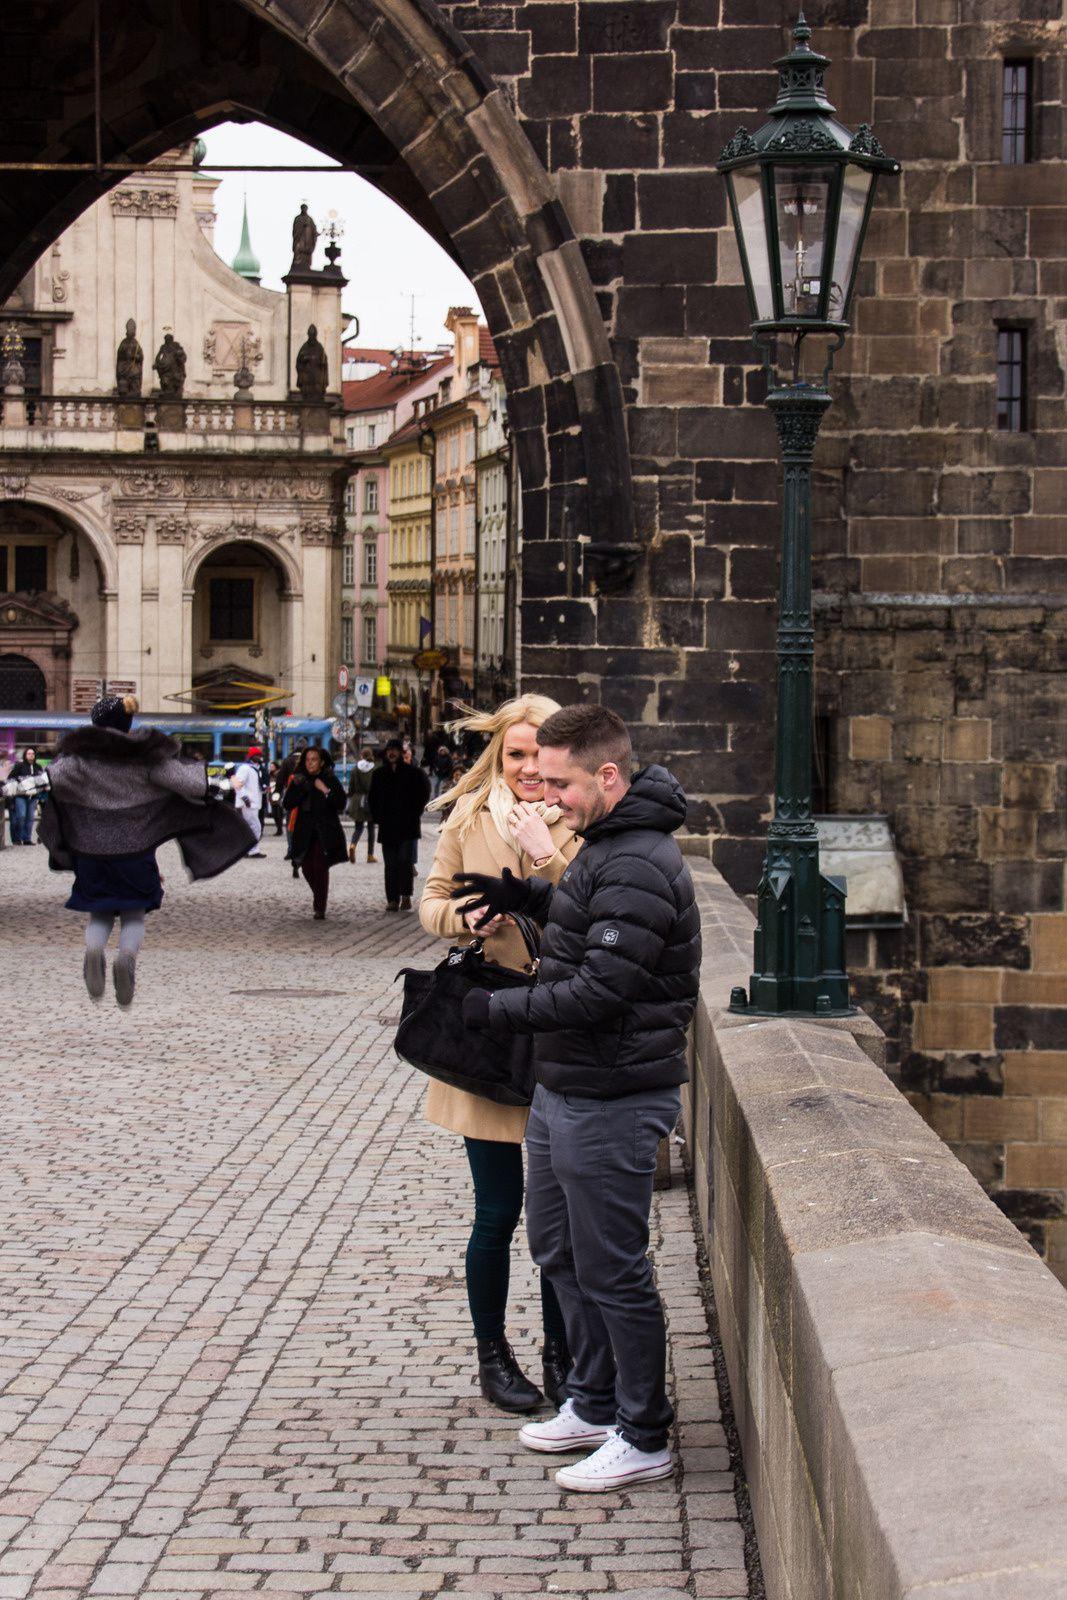 STREET PHOTOGRAPHY : PRAGUE EN COULEURS